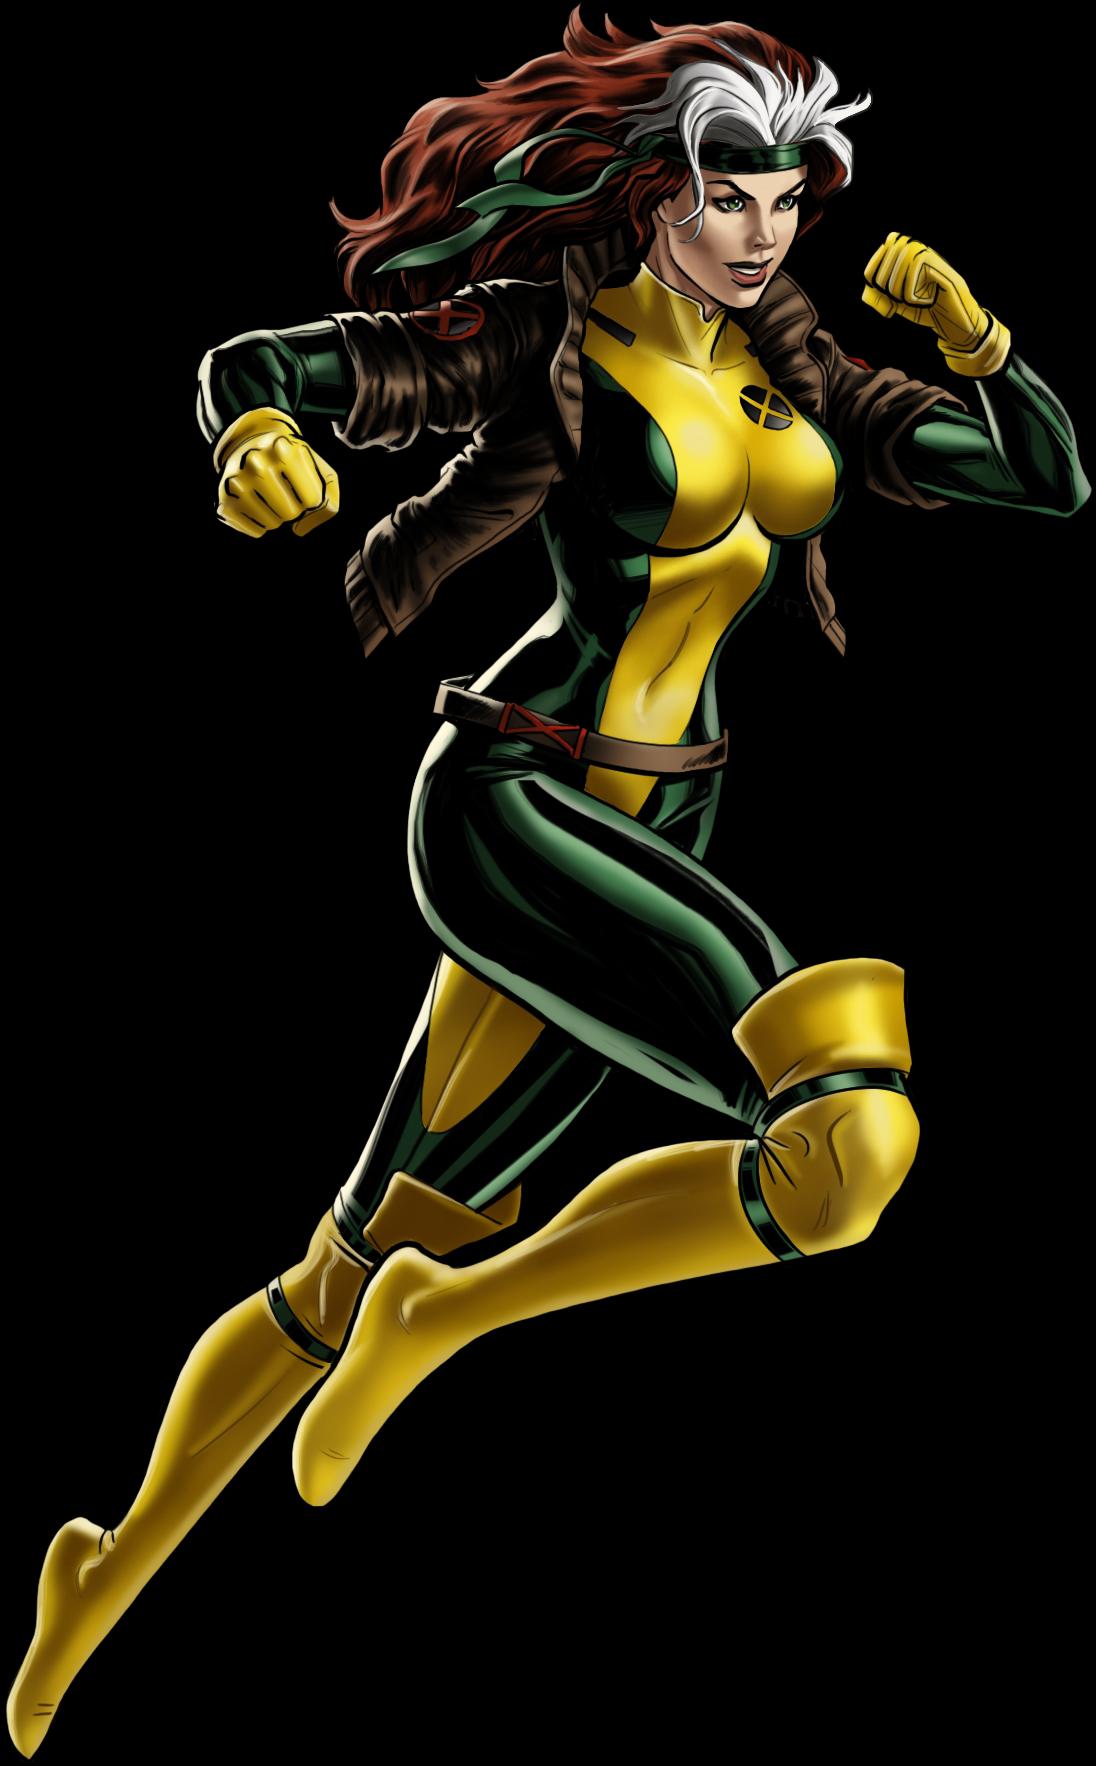 Marvel's Daredevil, Season 2 Hell's Kitchen Daisy Johnson Turk Barrett,  Daredevil, luke Cage, agents Of Shield, punisher png   Klipartz